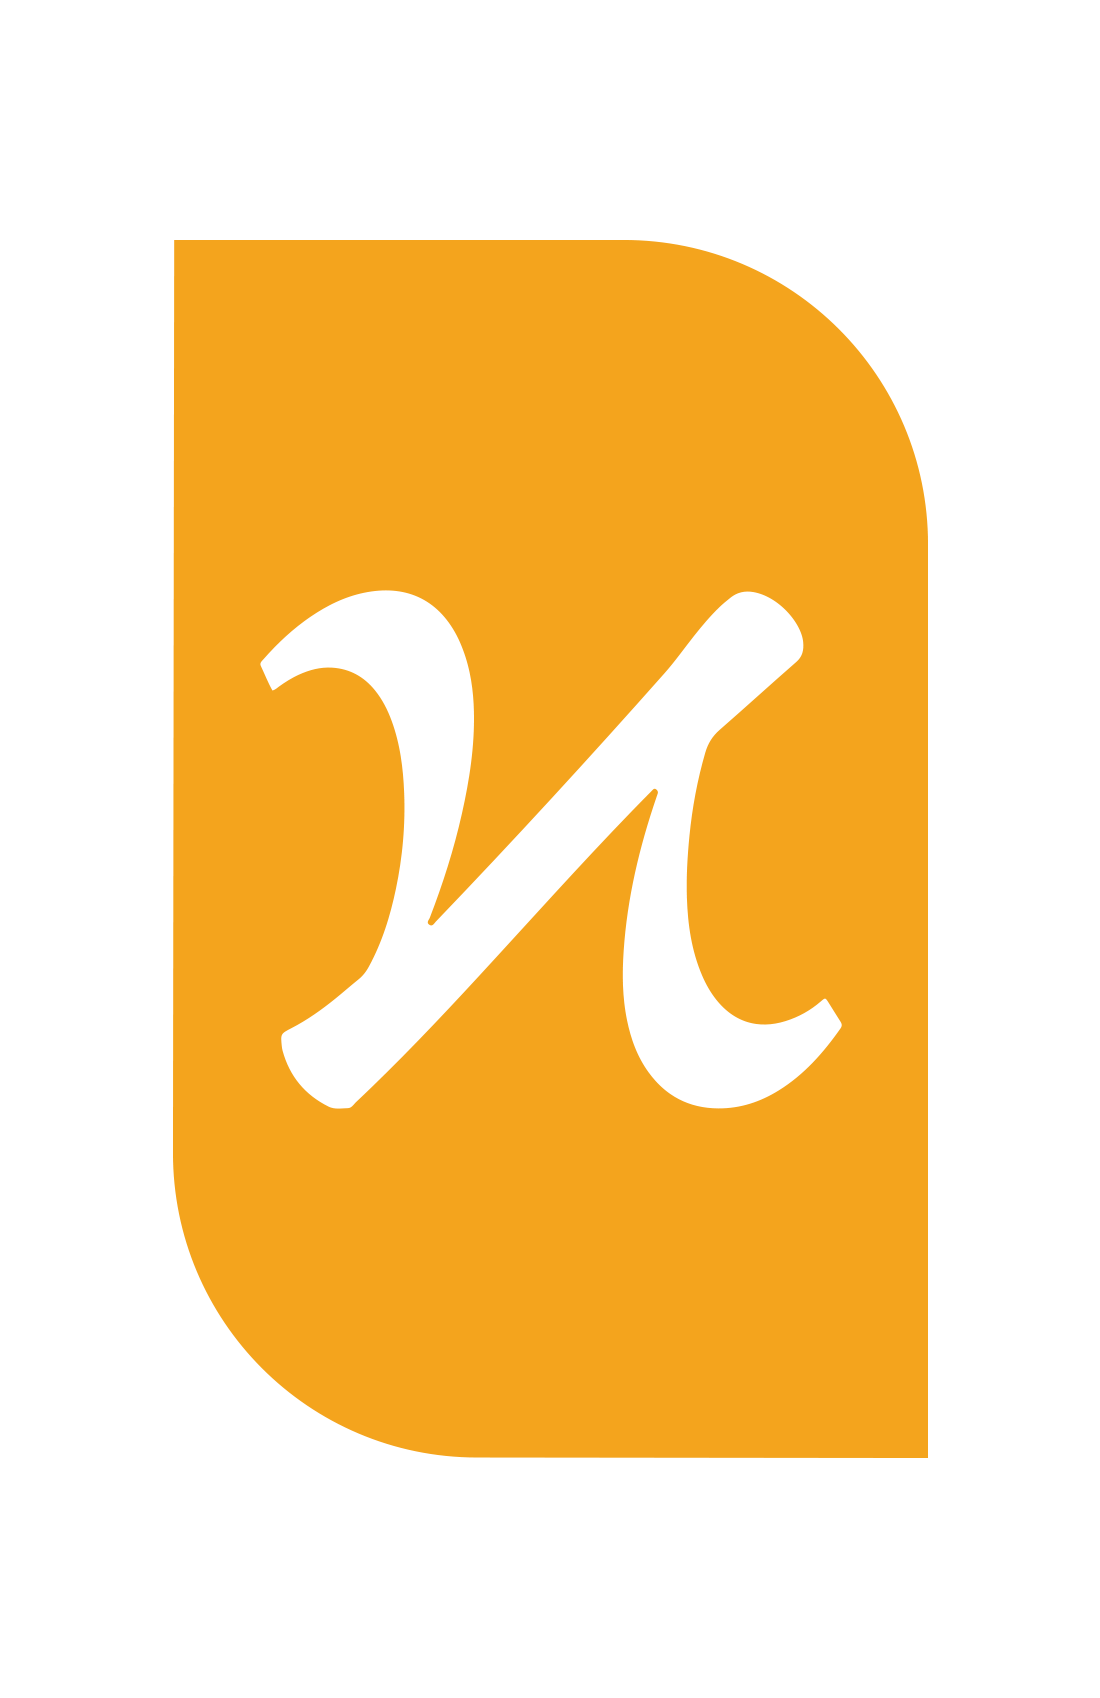 KTBYTE Computer Science Academy